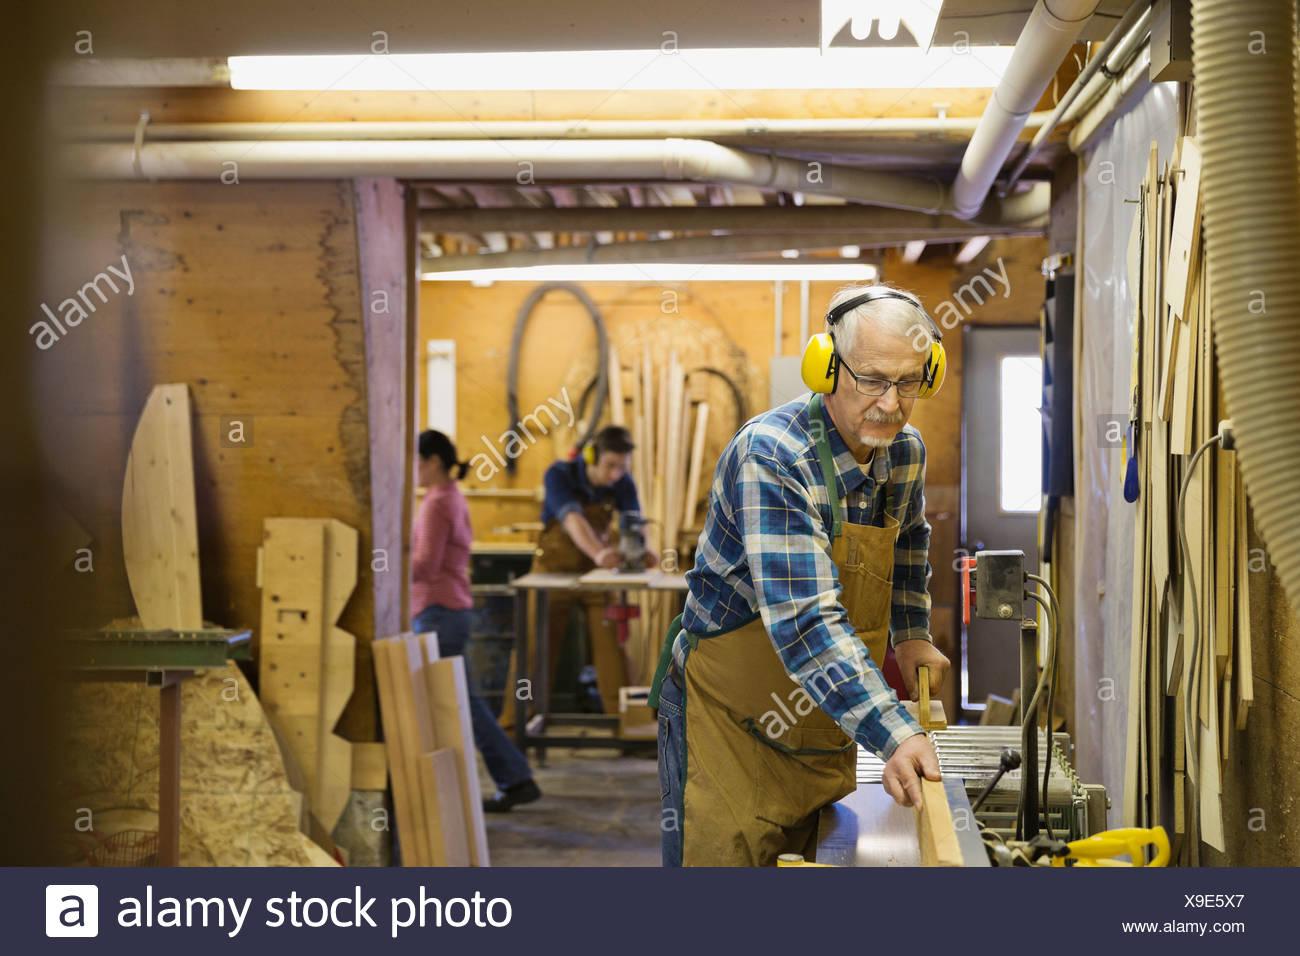 Senior carpenter using equipment in workshop - Stock Image